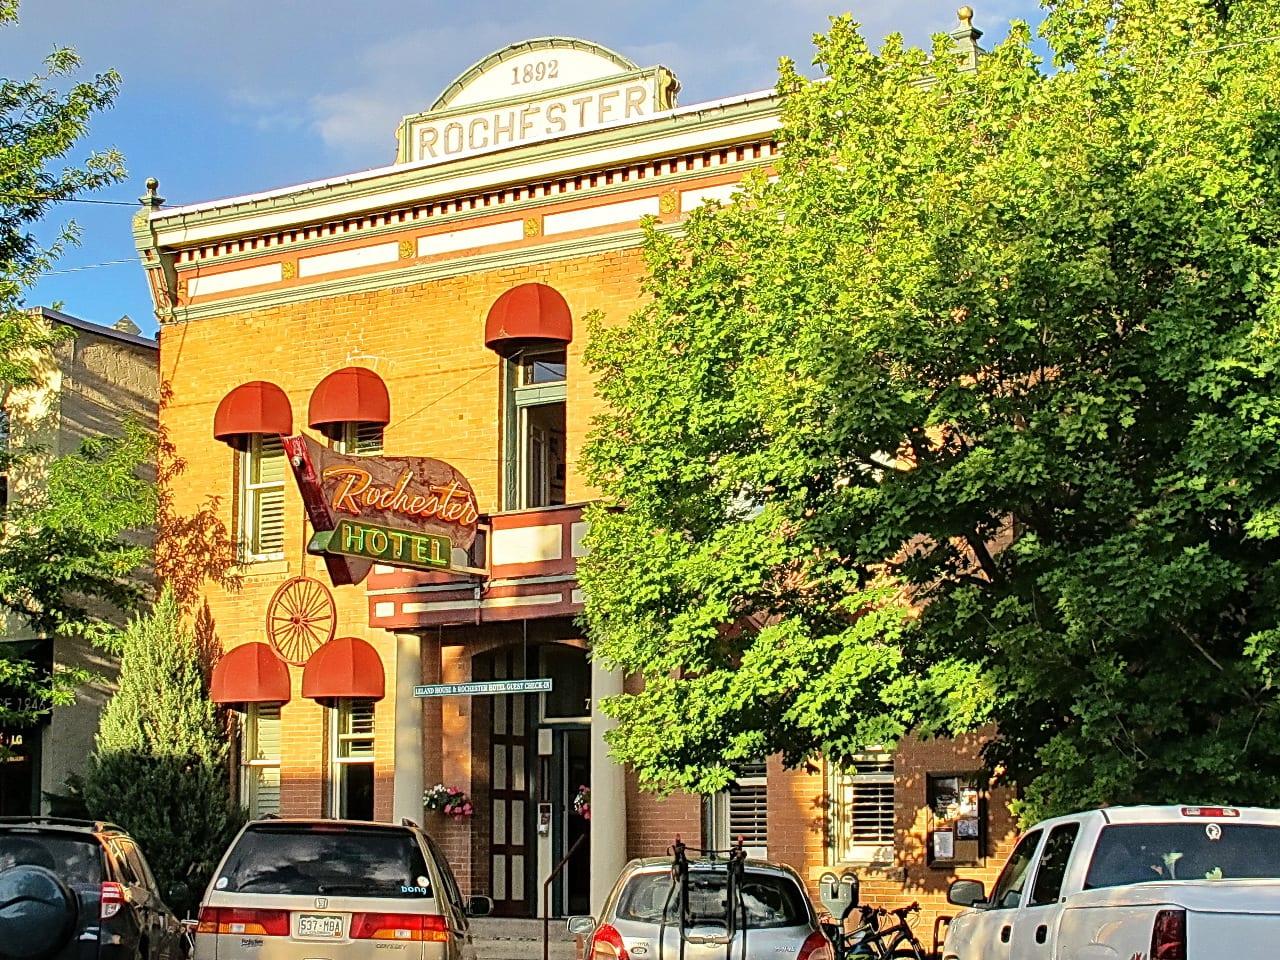 Rochester Hotel Durango Summer